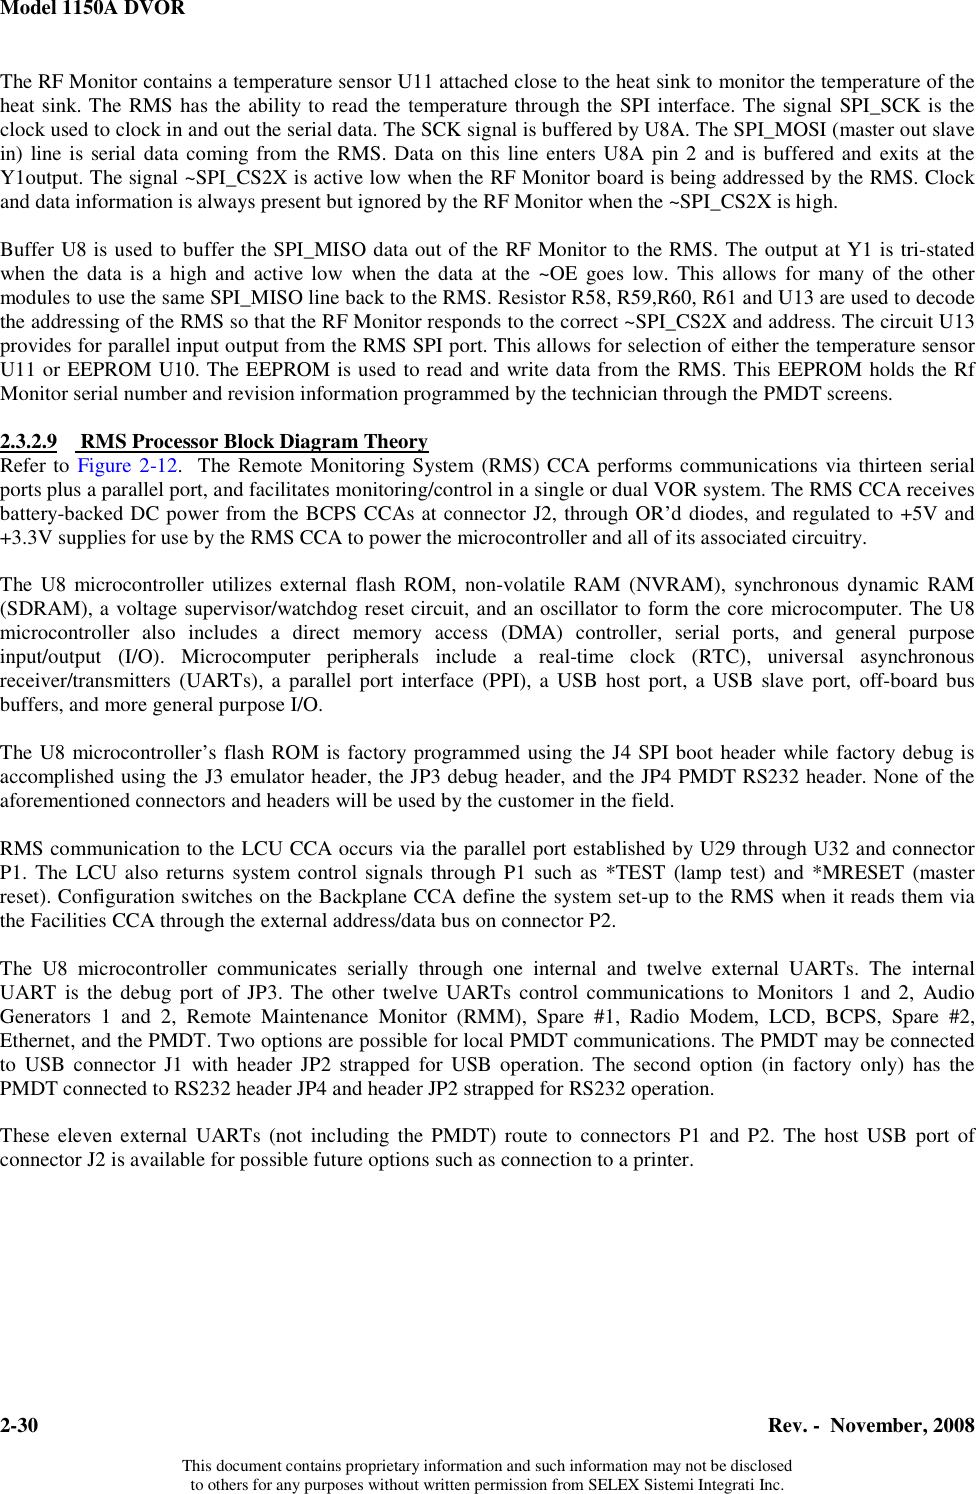 Selex Sistemi Integrati Vor2 Vor Transmitter User Manual 571150a 0002